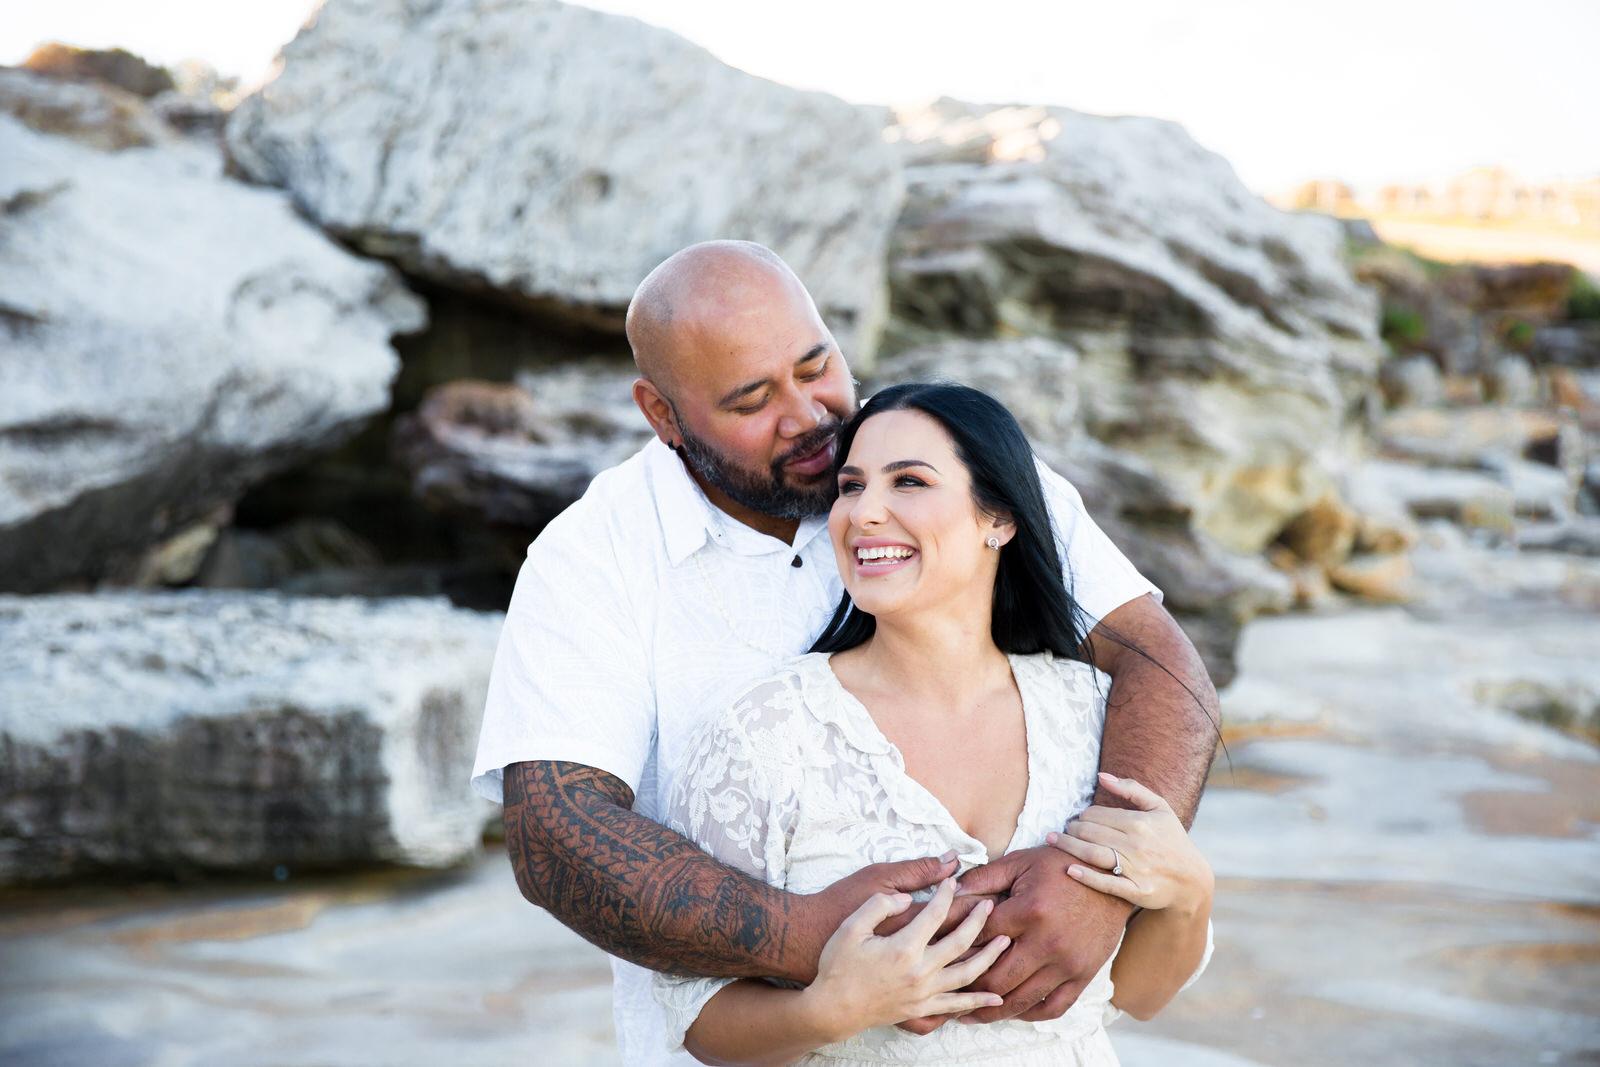 Sydney Wedding Photographer - Maroubra Beach - Jennifer Lam Photography (3).jpg